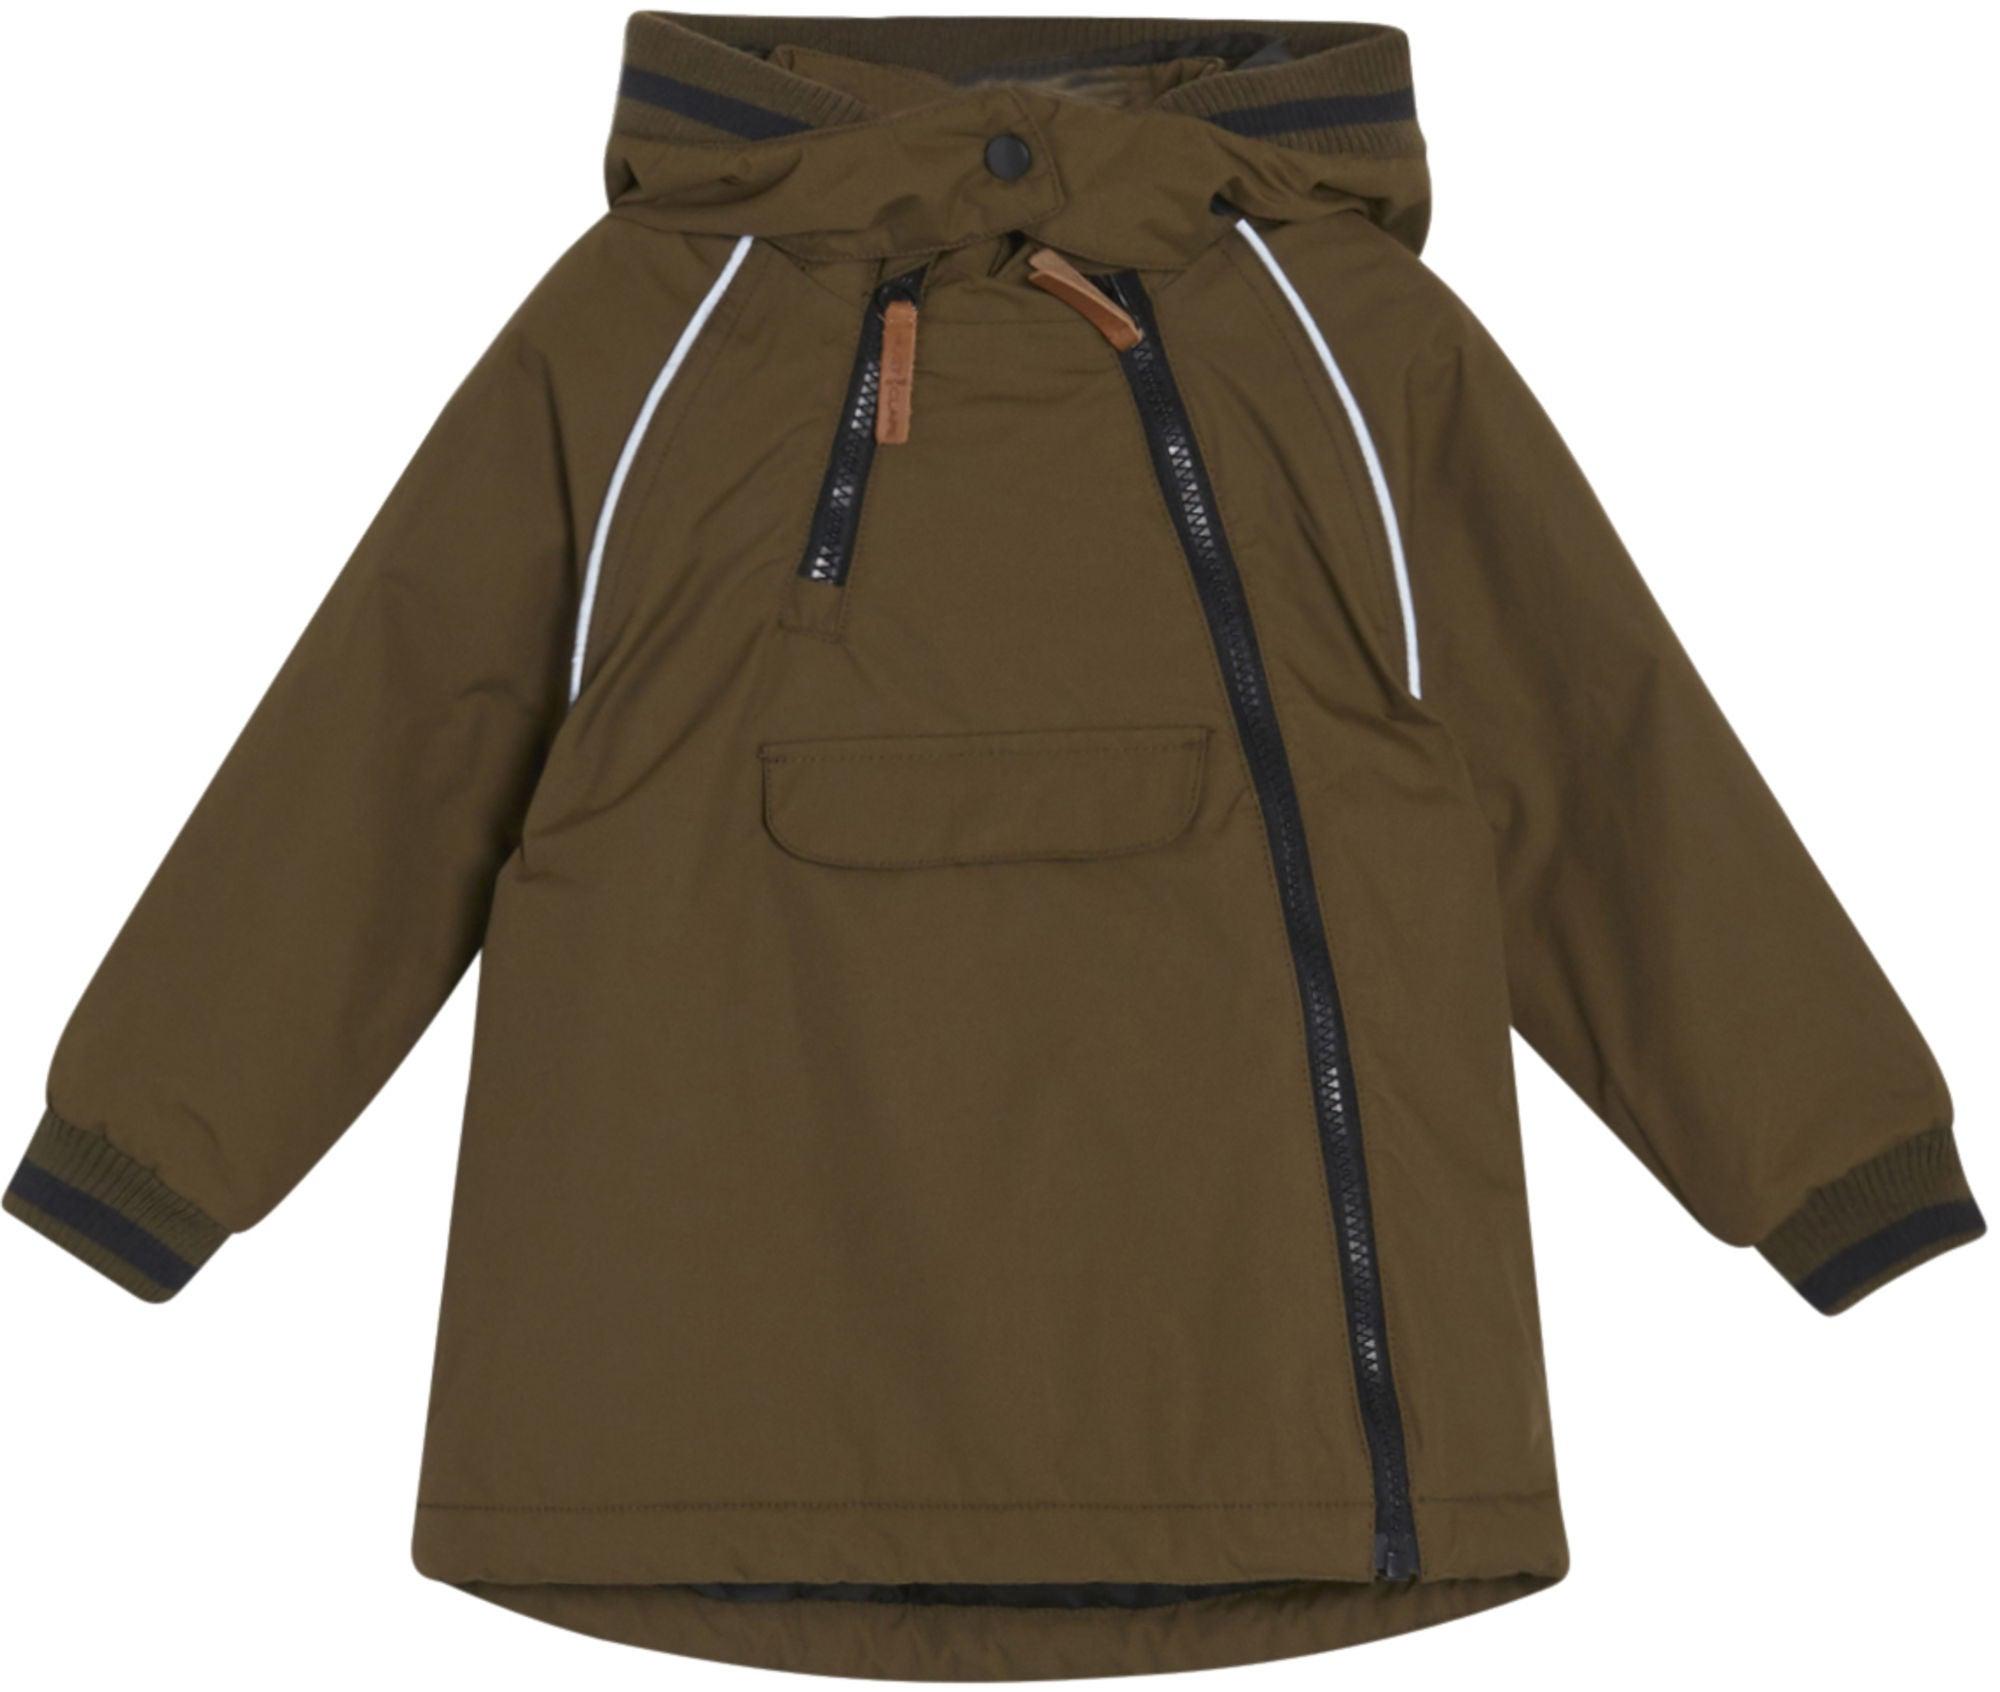 Kjøp Hust & Claire Obia Jacket, Lilacish | Jollyroom